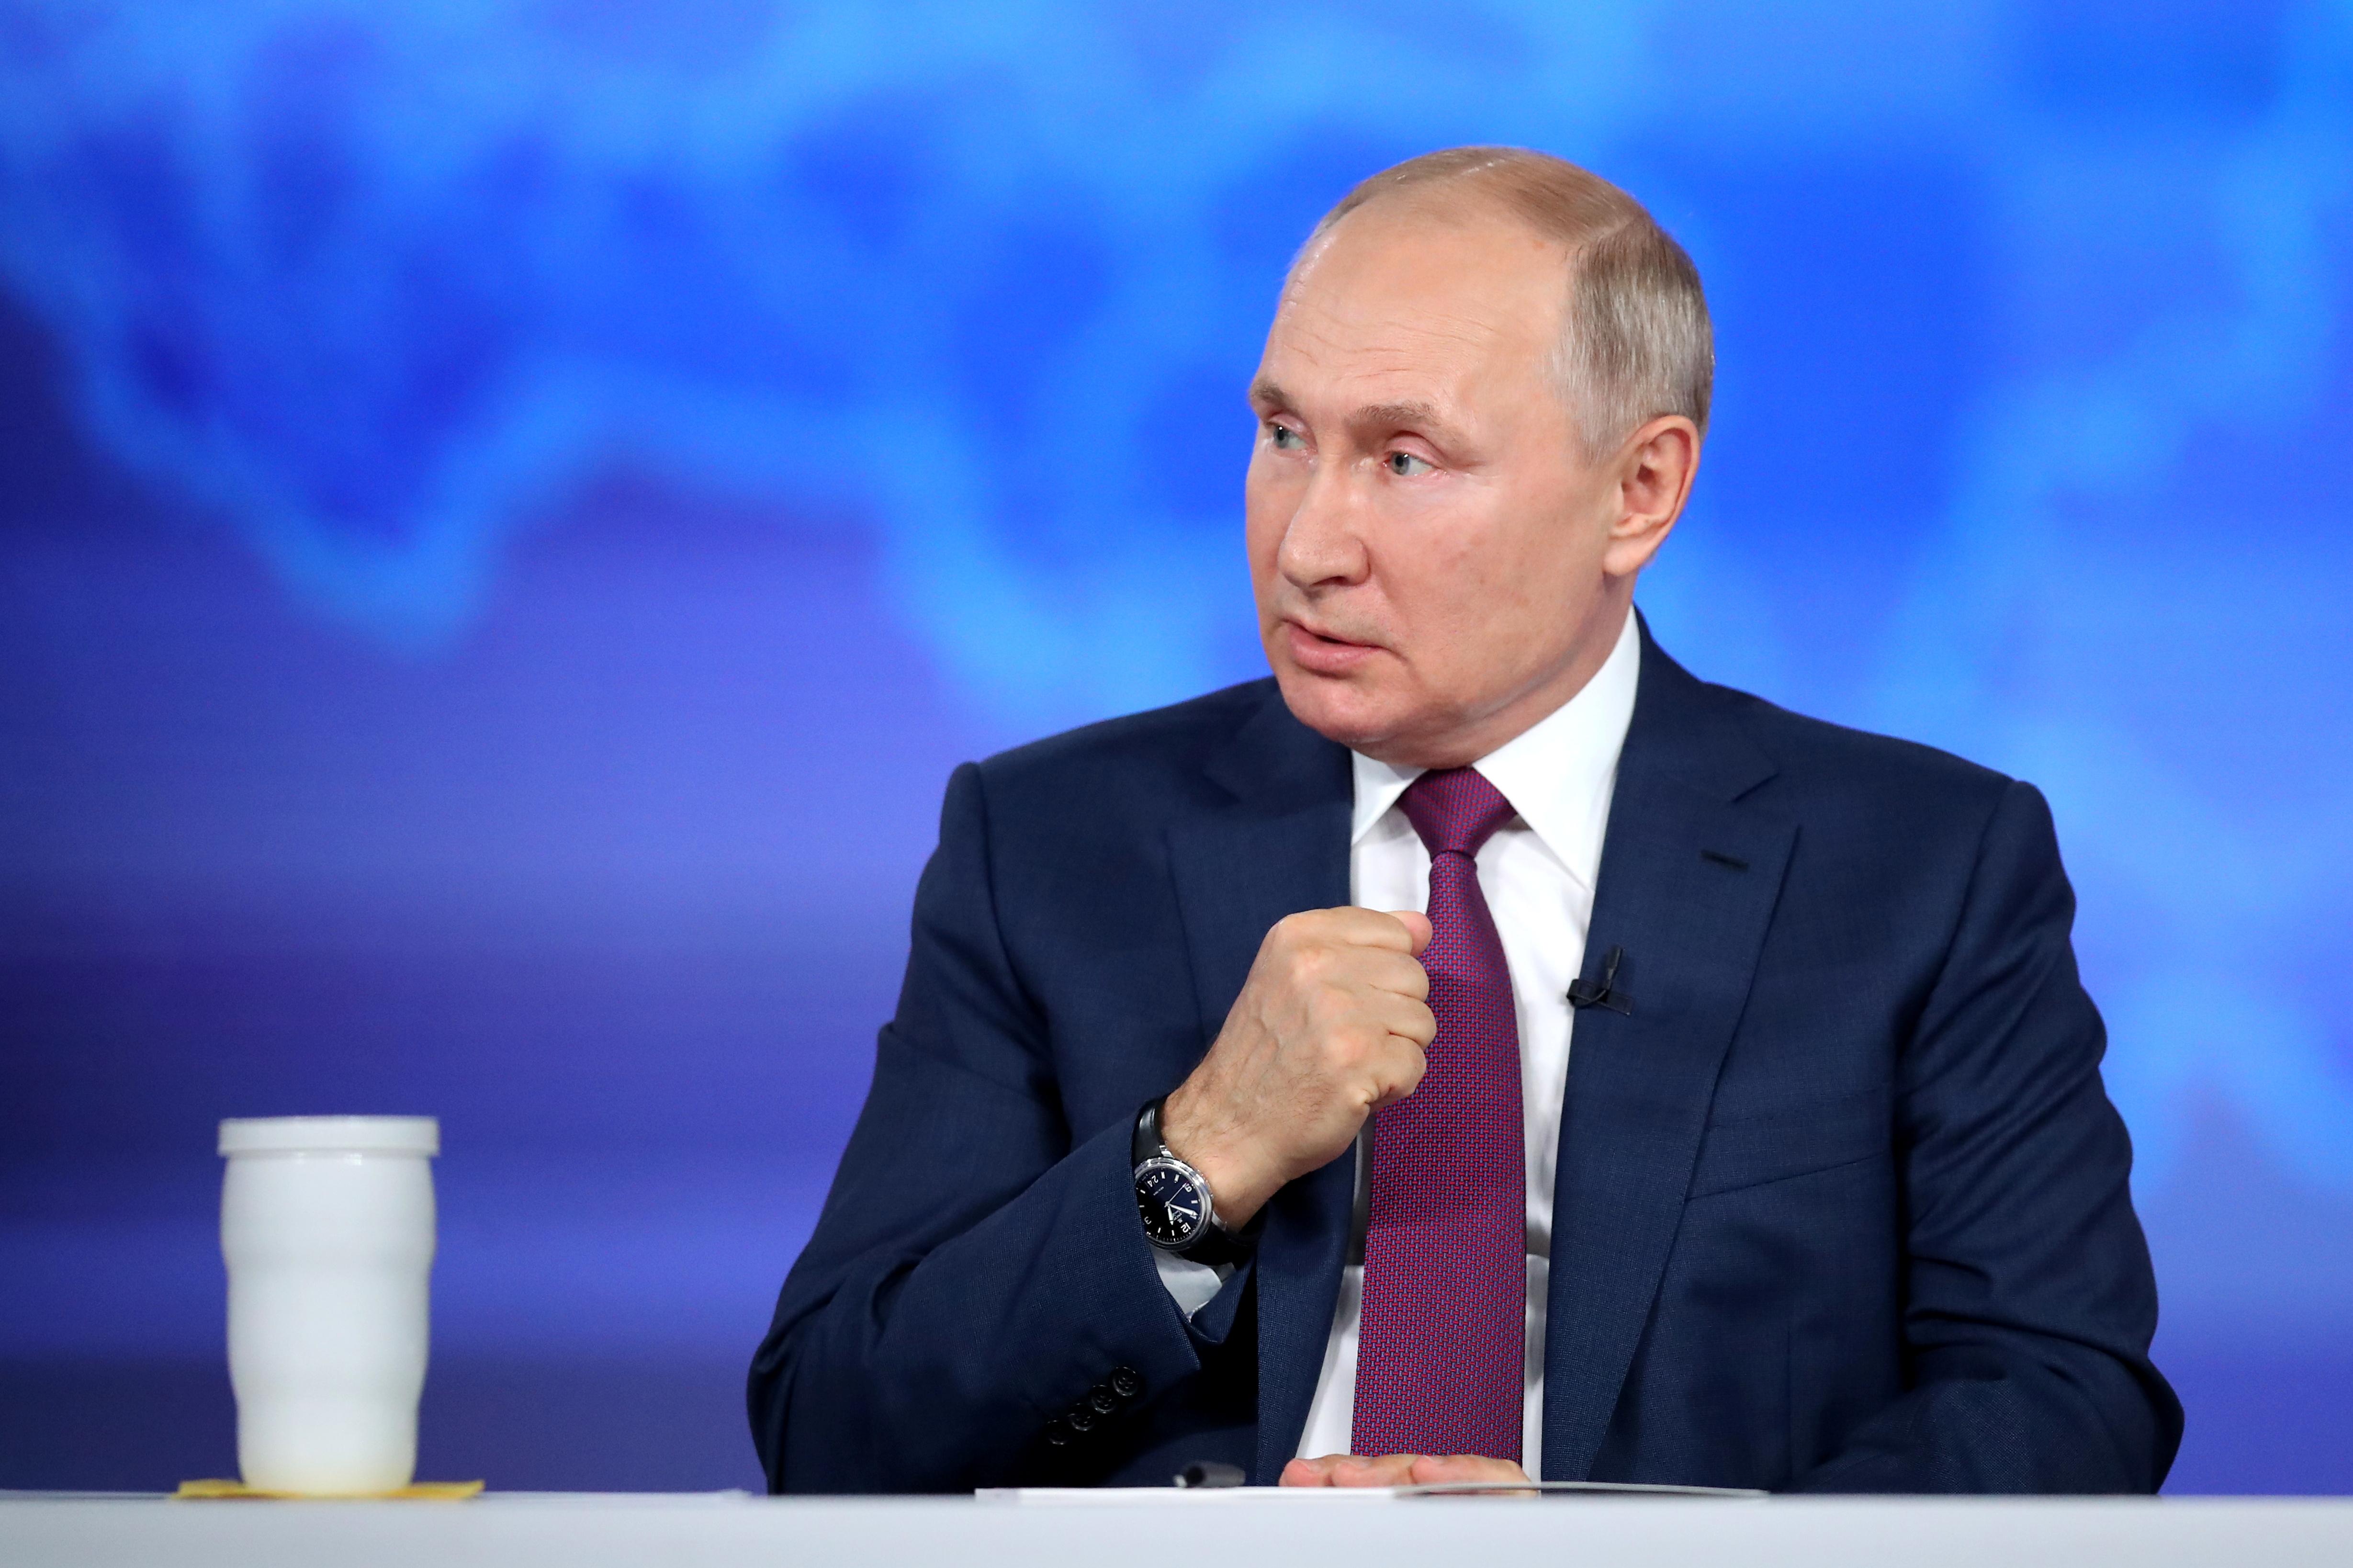 Russian President Vladimir Putin speaks during an annual nationwide televised phone-in show in Moscow, Russia June 30, 2021. Sputnik/Sergei Savostyanov/Pool via REUTERS